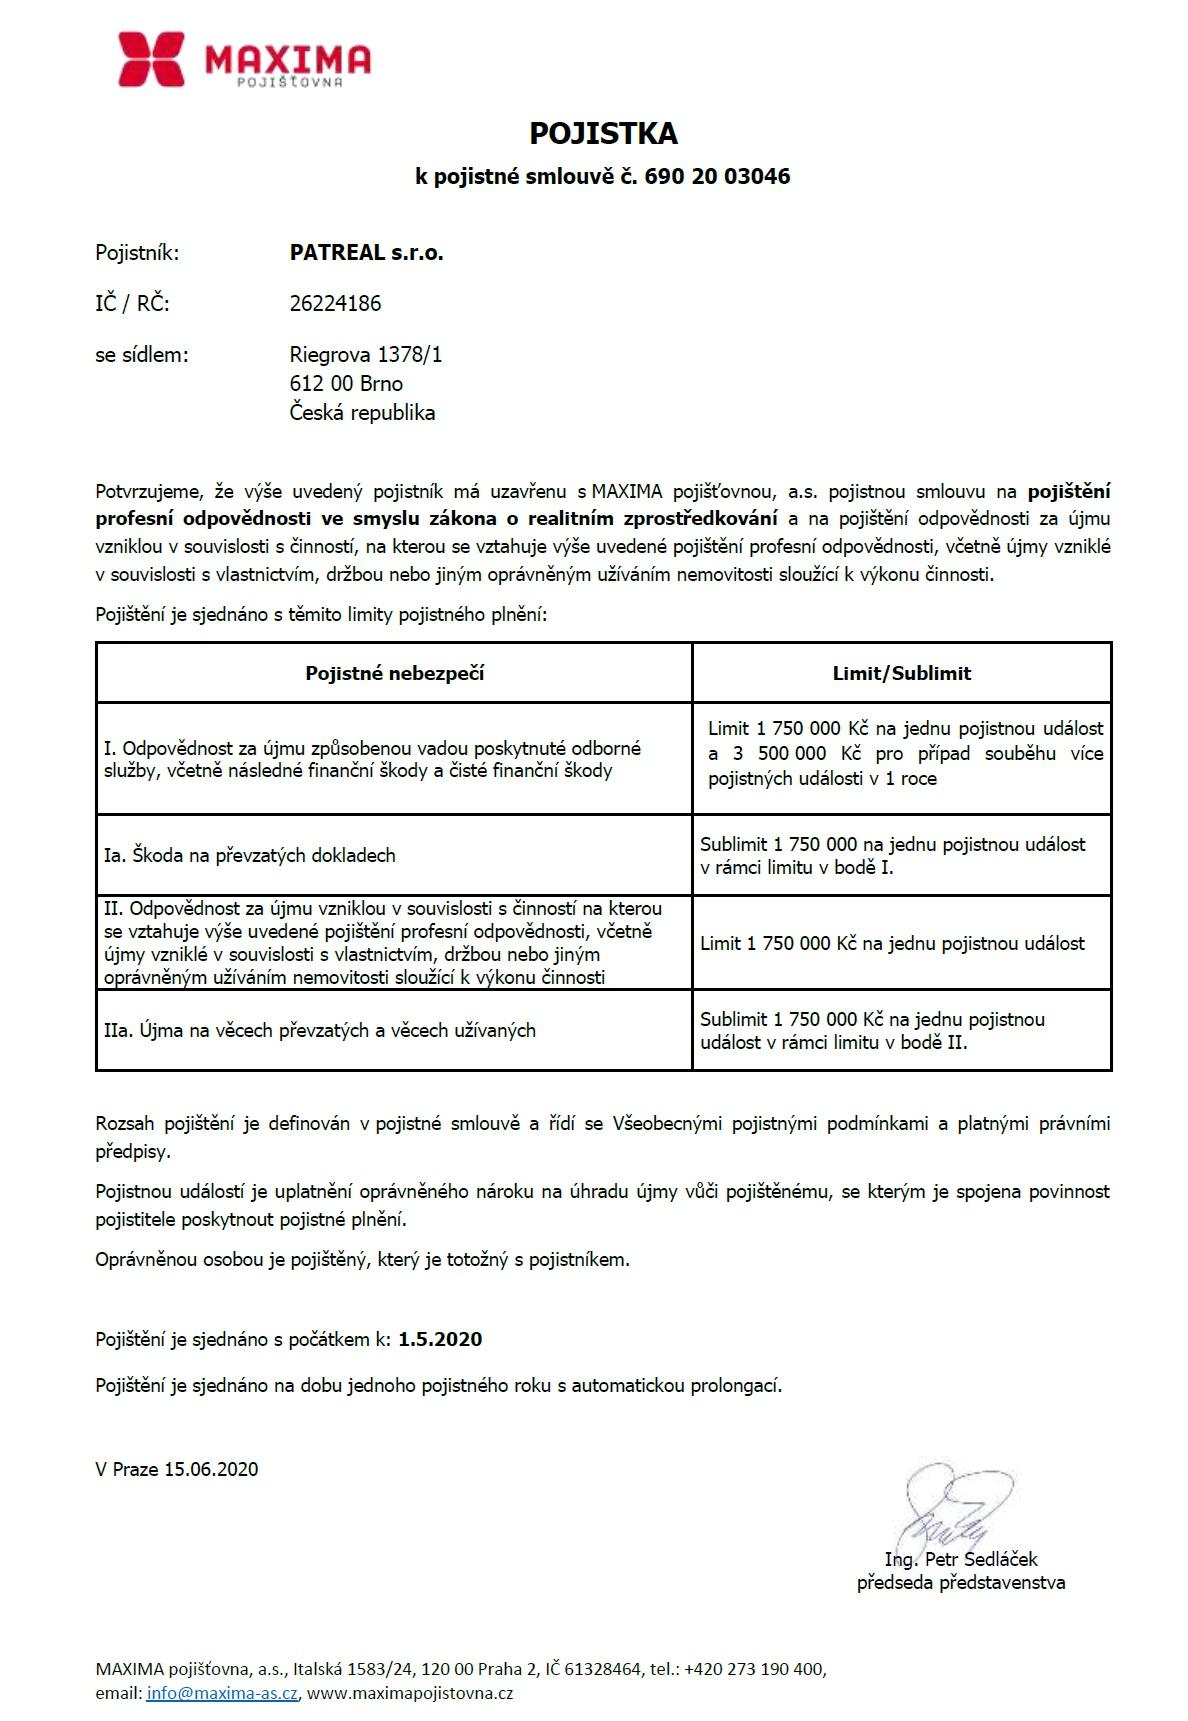 certifikát_patreal